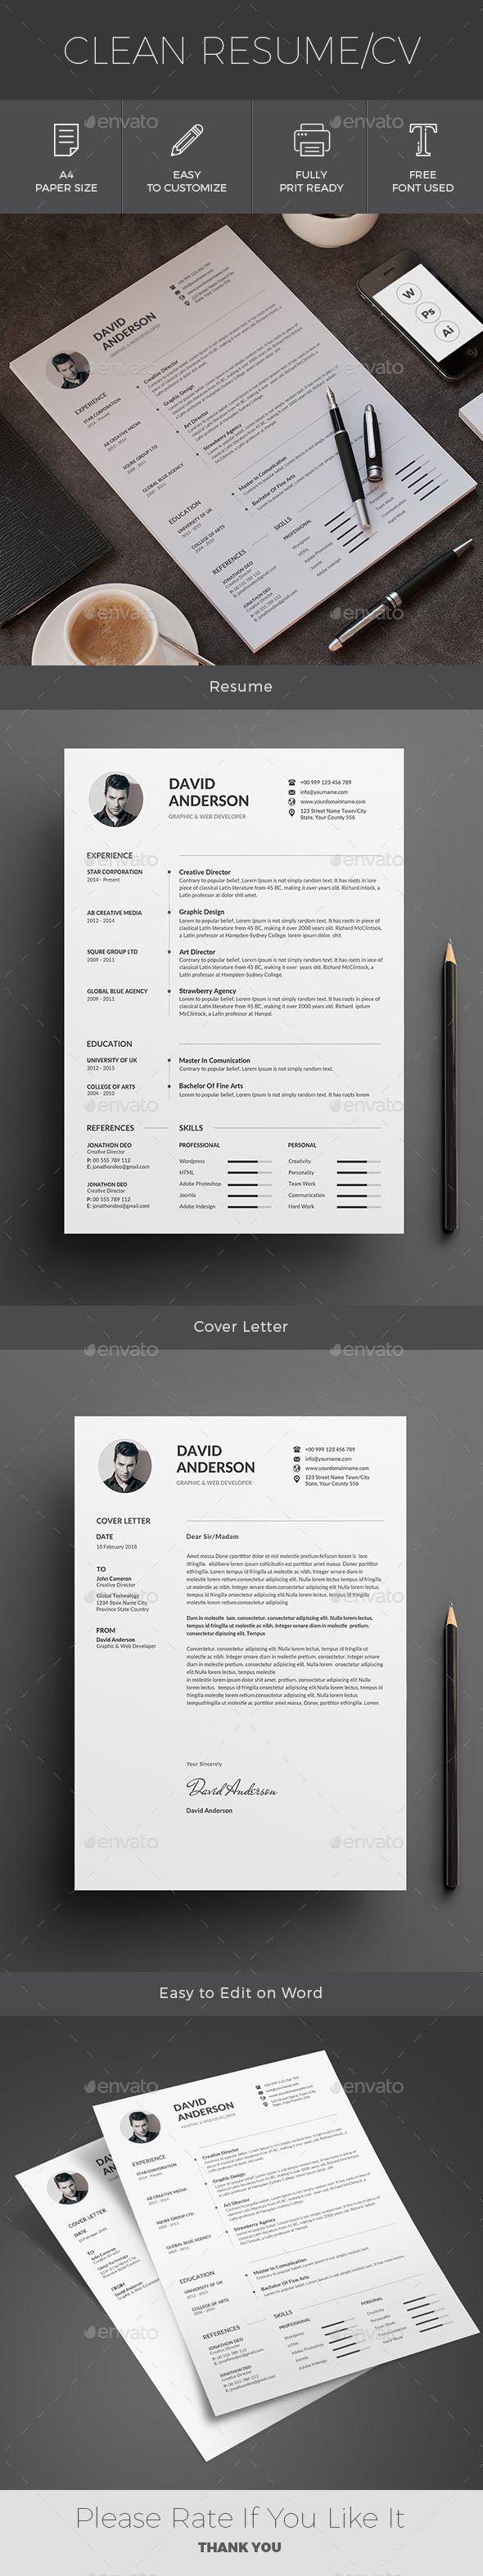 Resume - Resumes Stationery - CV Template